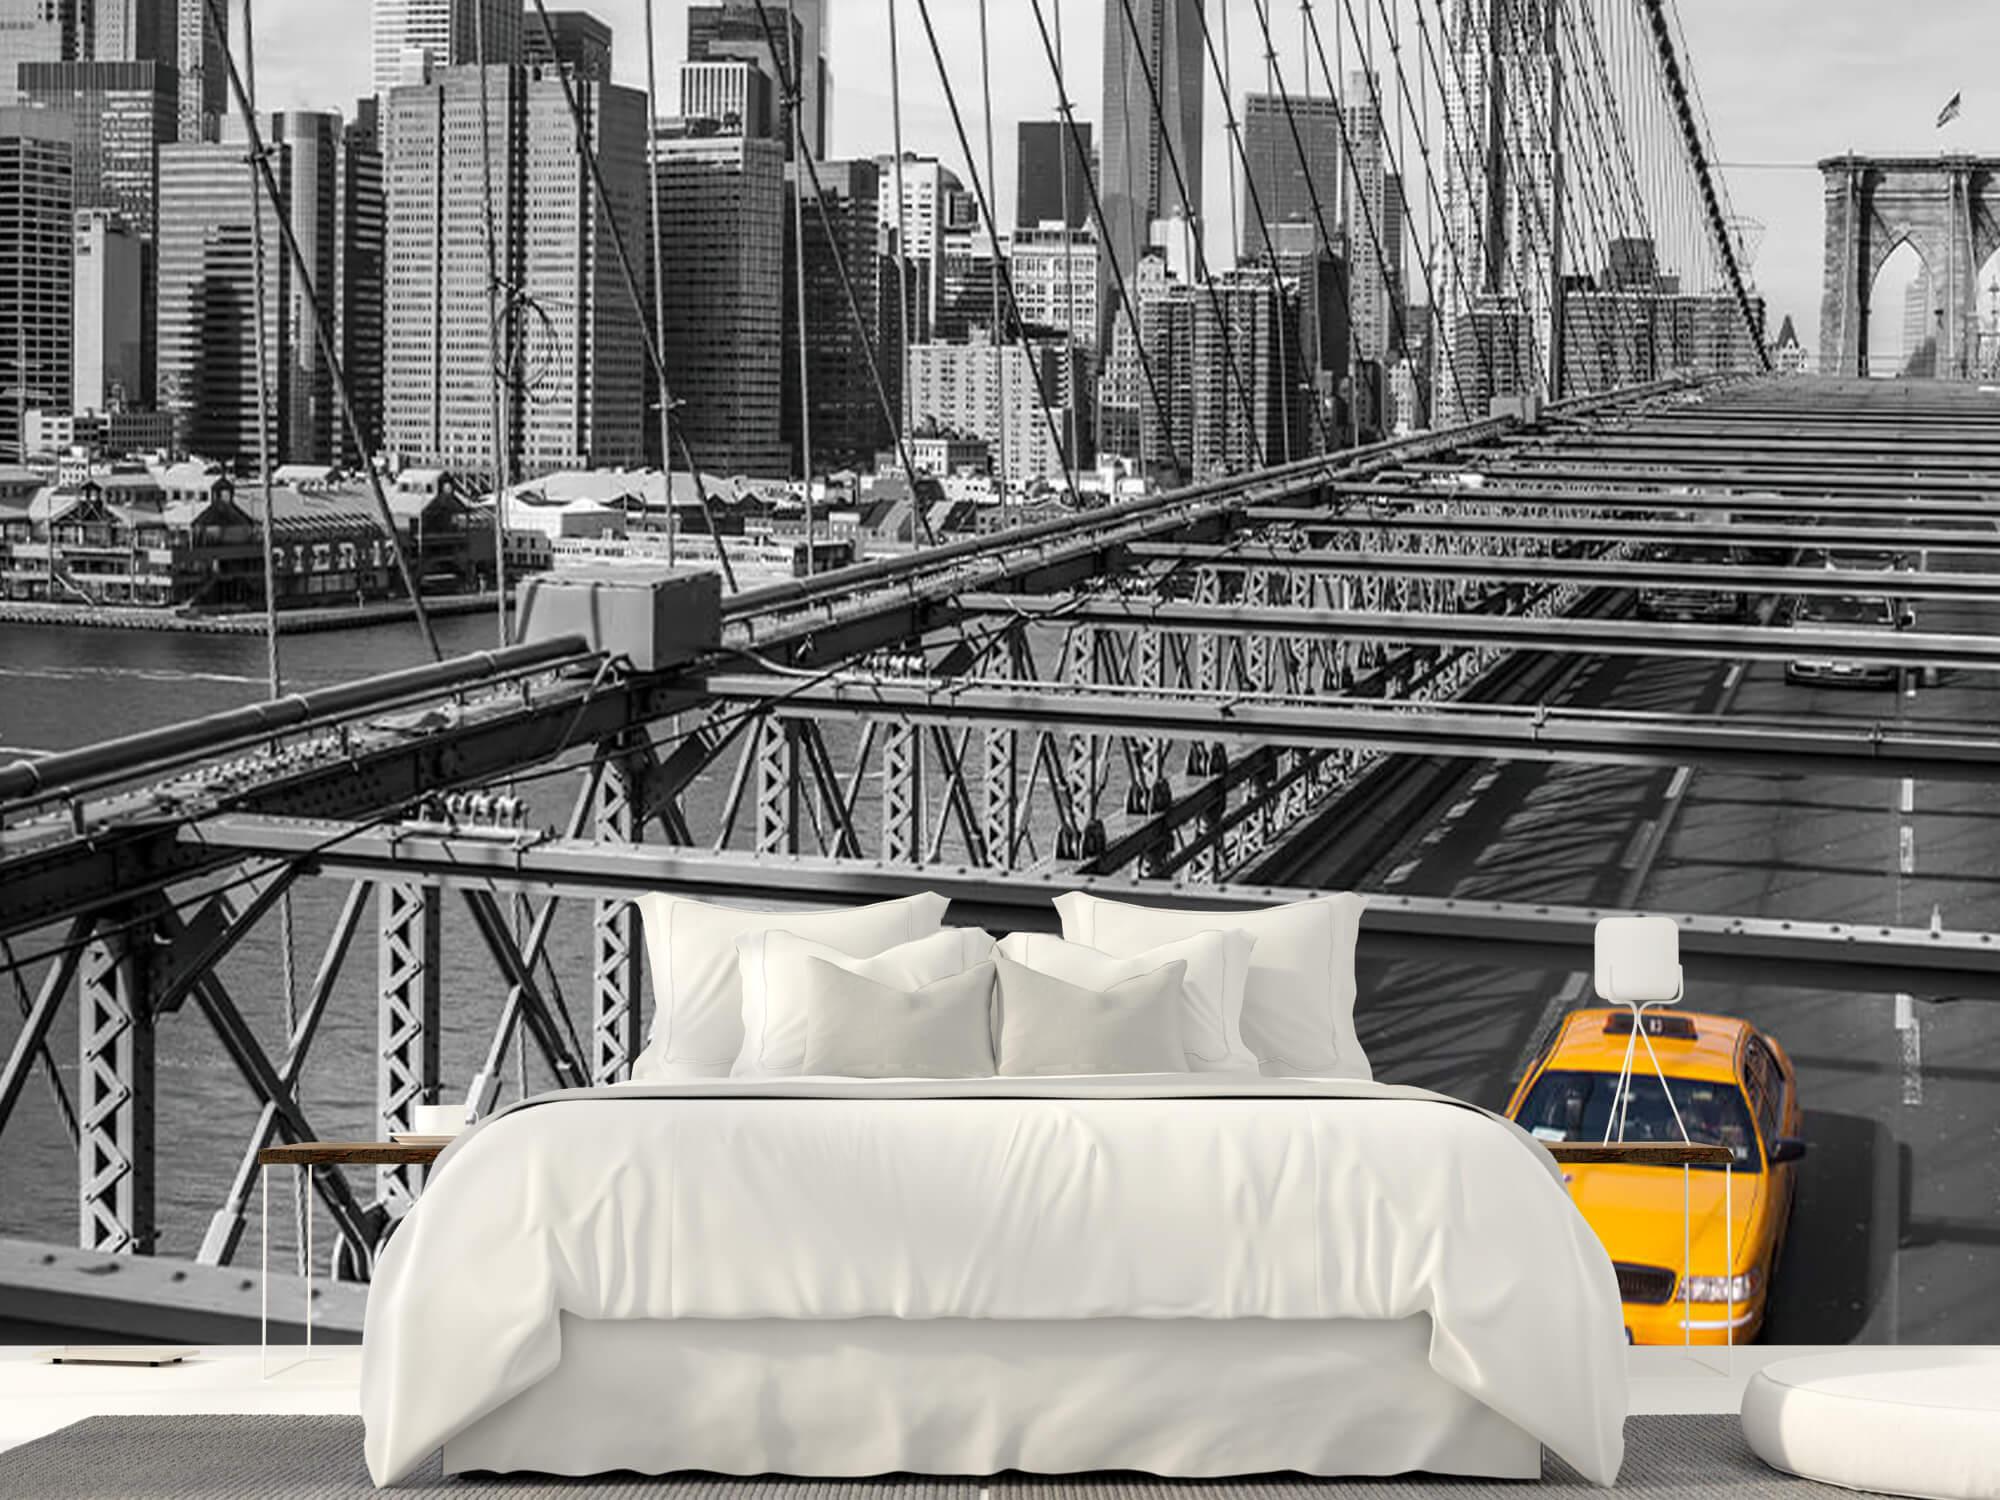 Un taxi sur le pont de Brooklyn 1